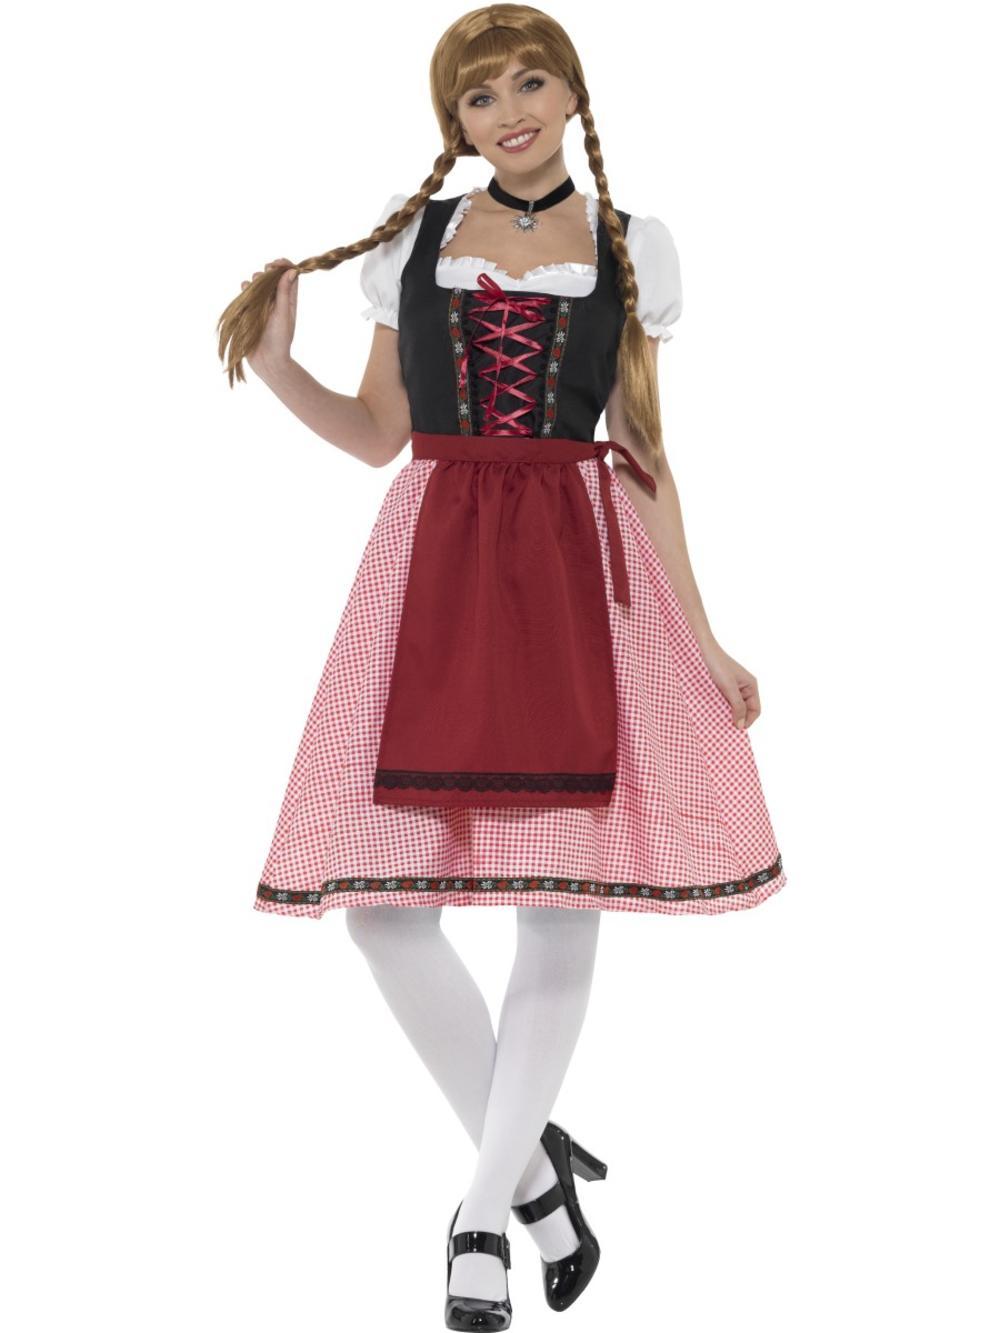 Bavarian Tavern Maid Ladies Fancy Dress German Beer Oktoberfest Adults Costume